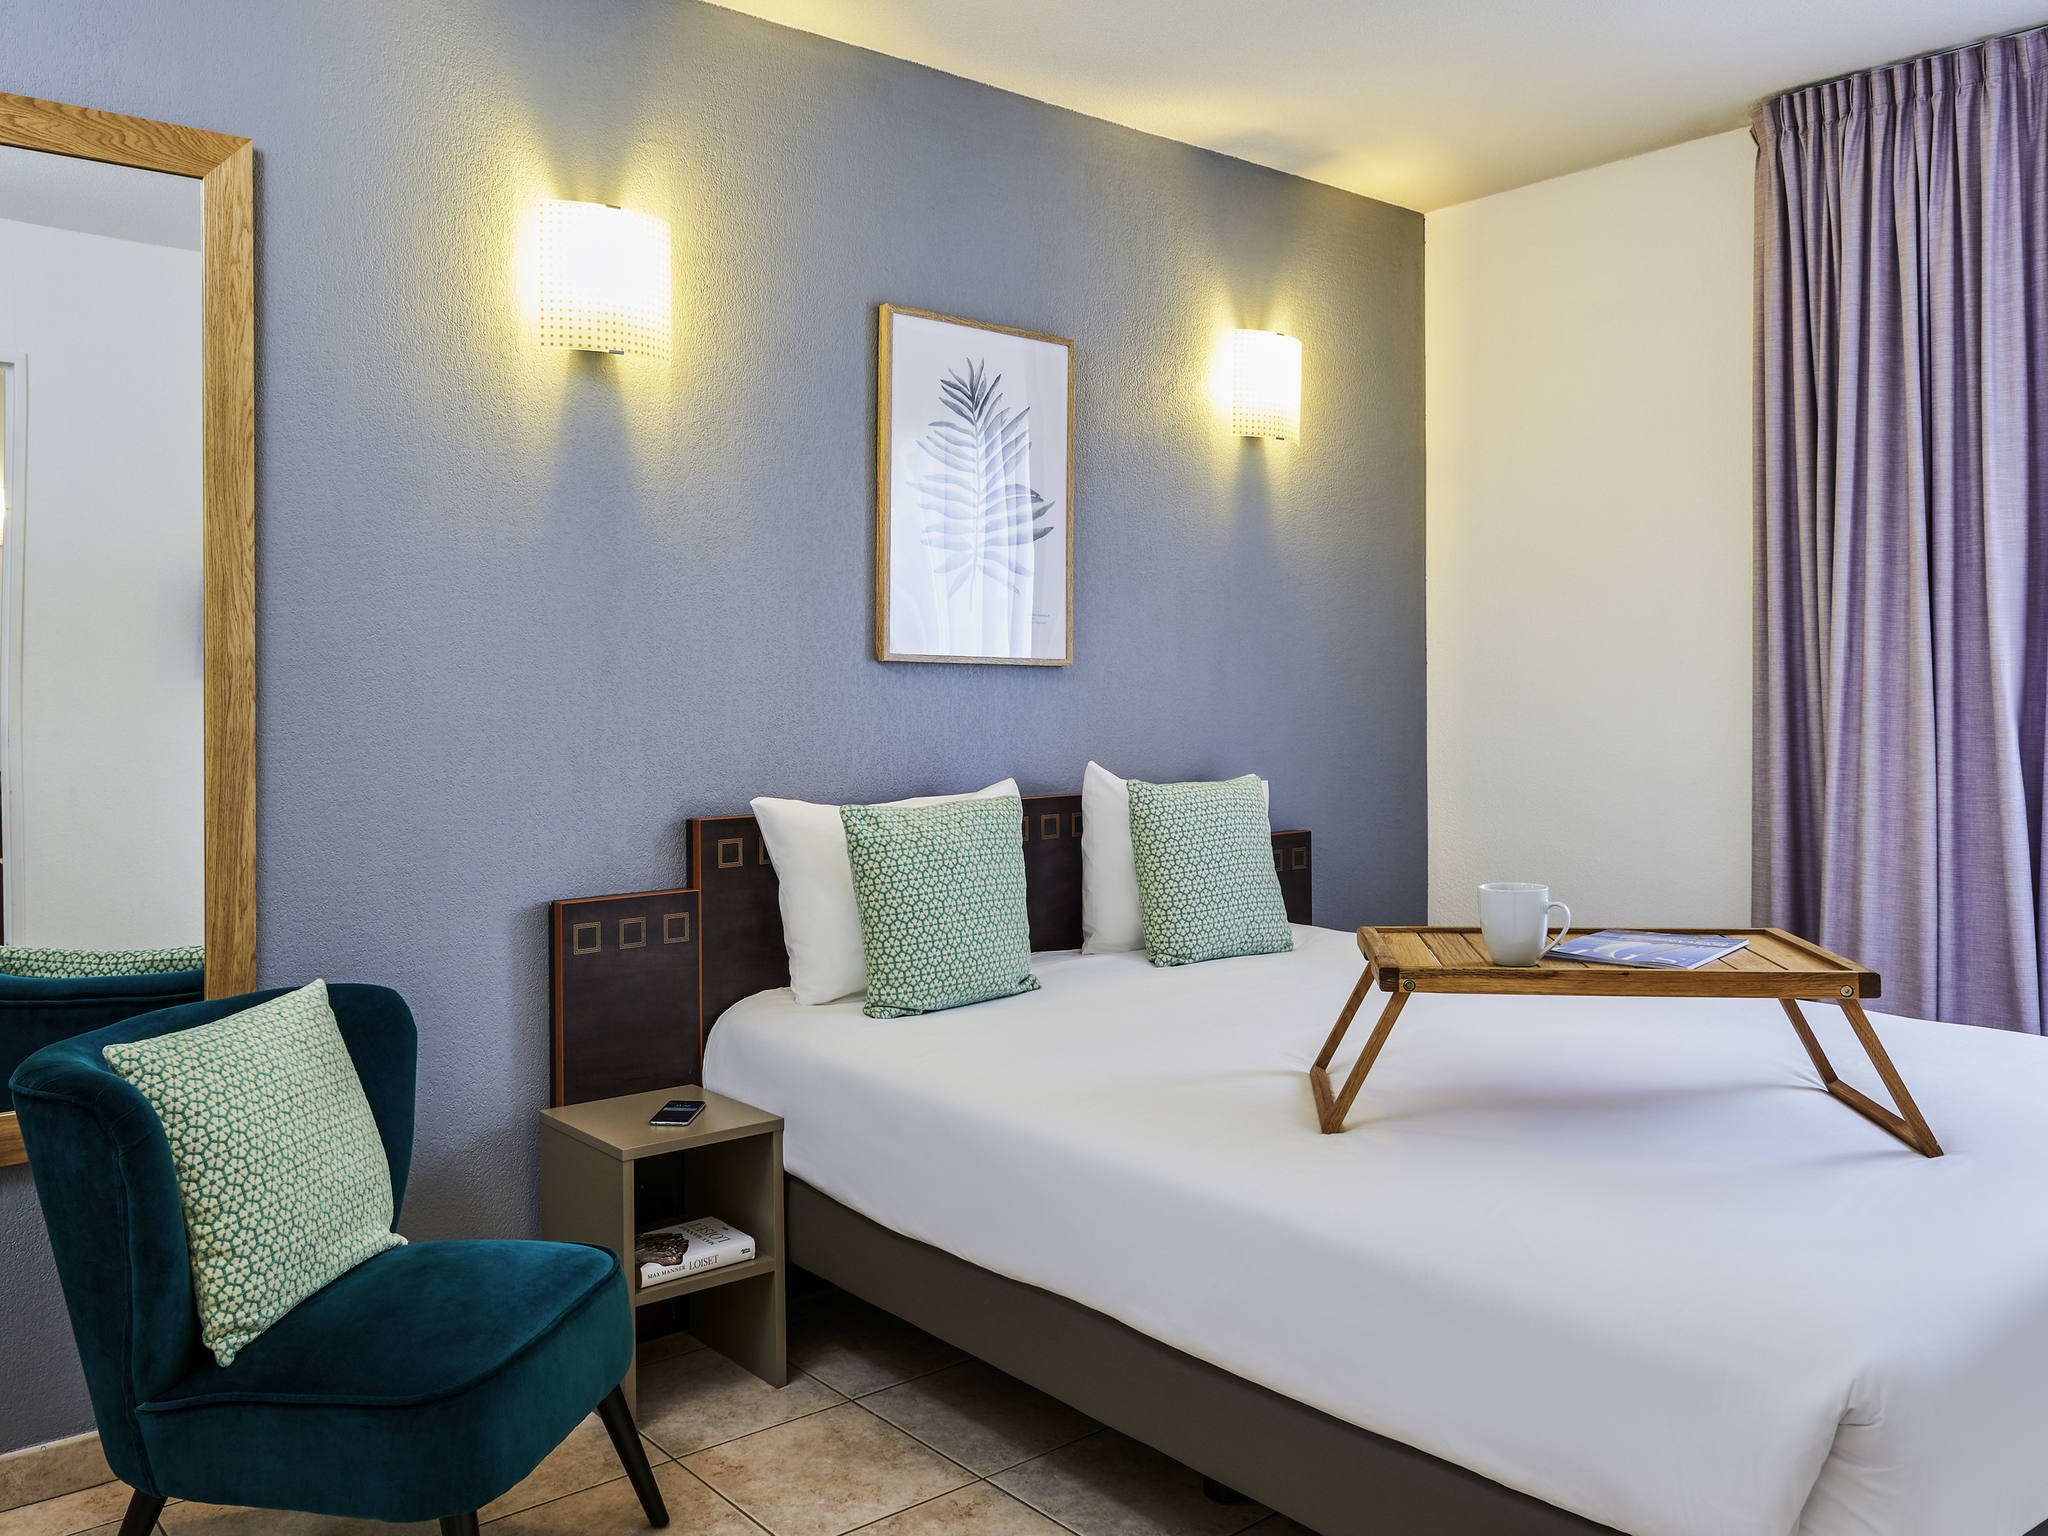 Hotel - Aparthotel Adagio access Nice Acropolis